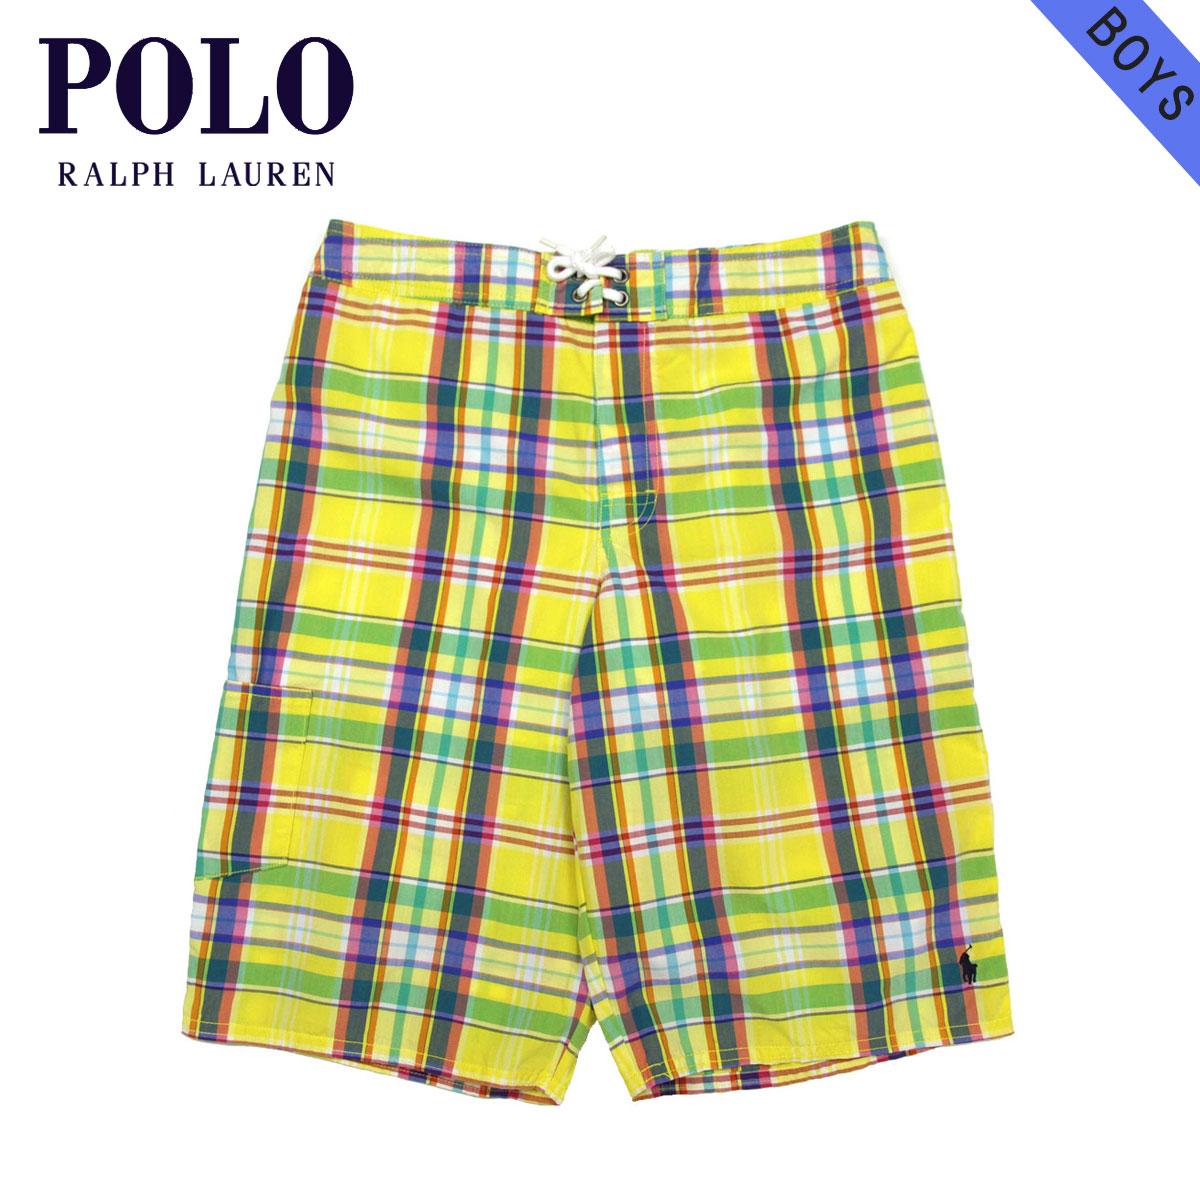 fa55329b62 Polo Ralph Lauren kids POLO RALPH LAUREN CHILDREN regular article  children's clothes Boys swimming underwear swimsuit ...